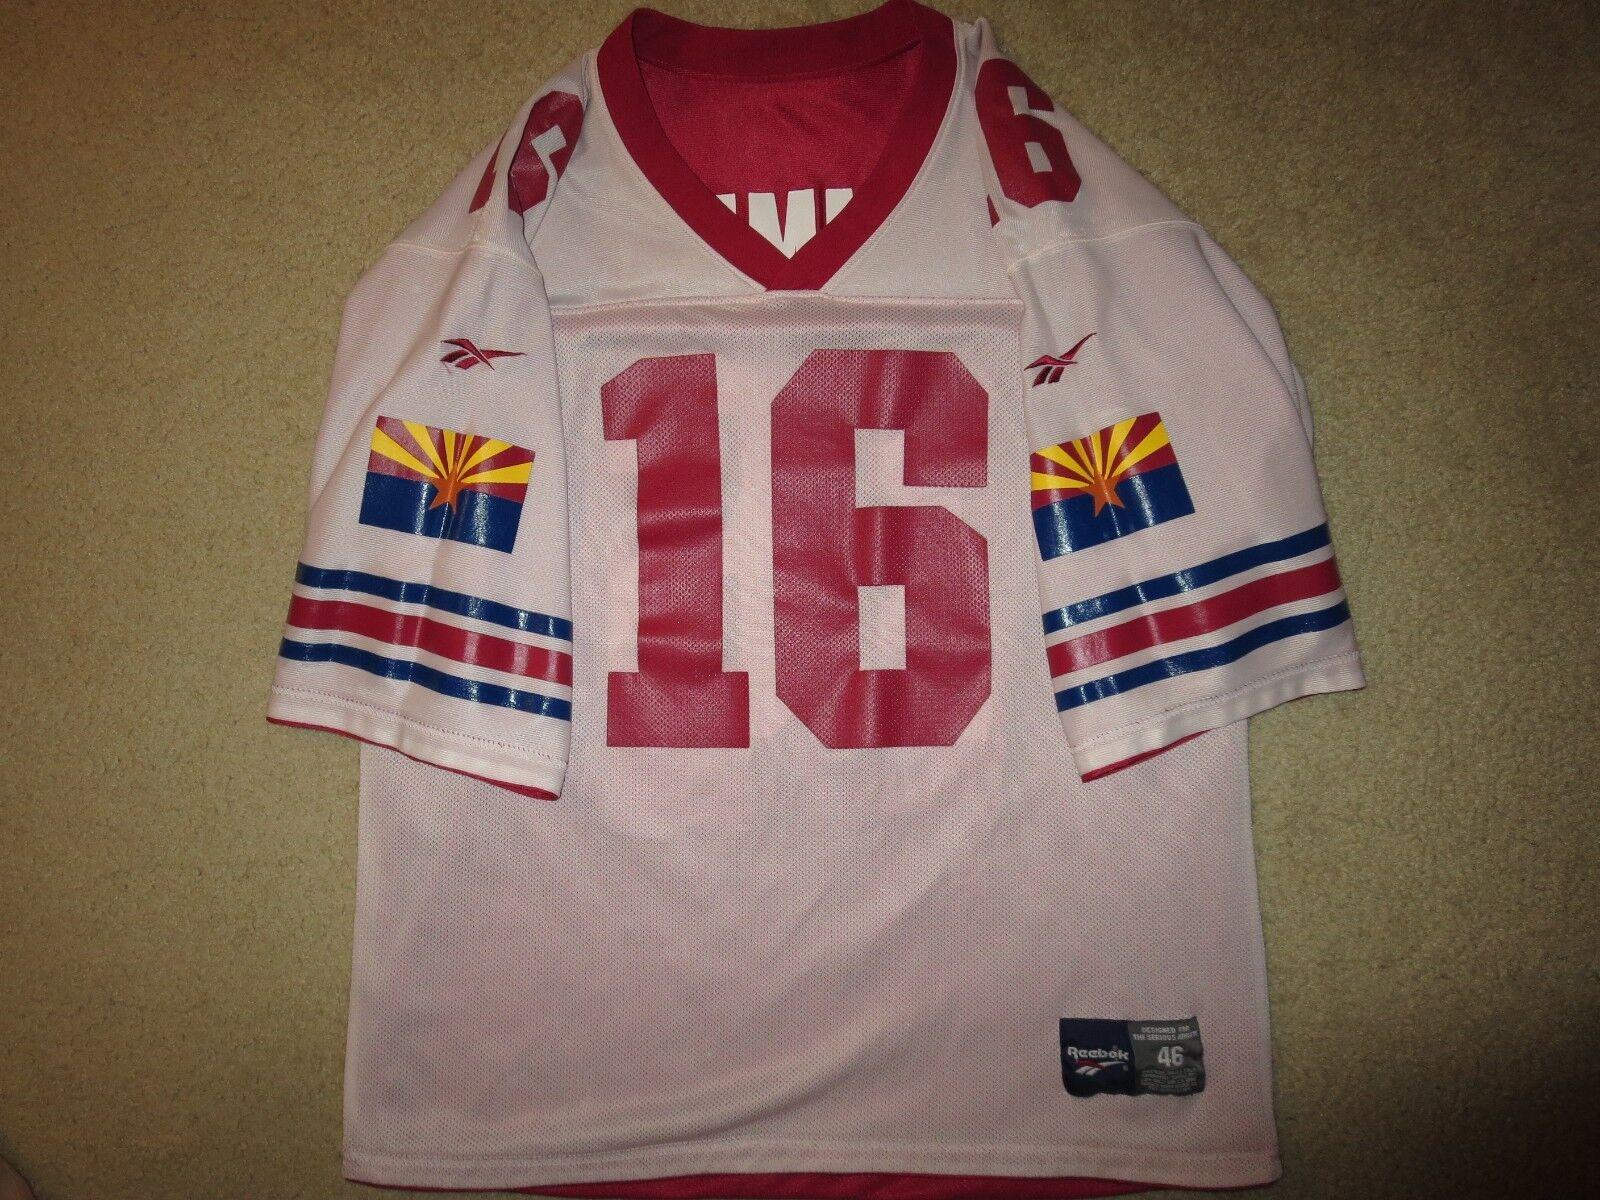 online store 0412f 8d463 Trikot NFL Reebok Reverse Cardinals Arizona 16 Stehlager ...